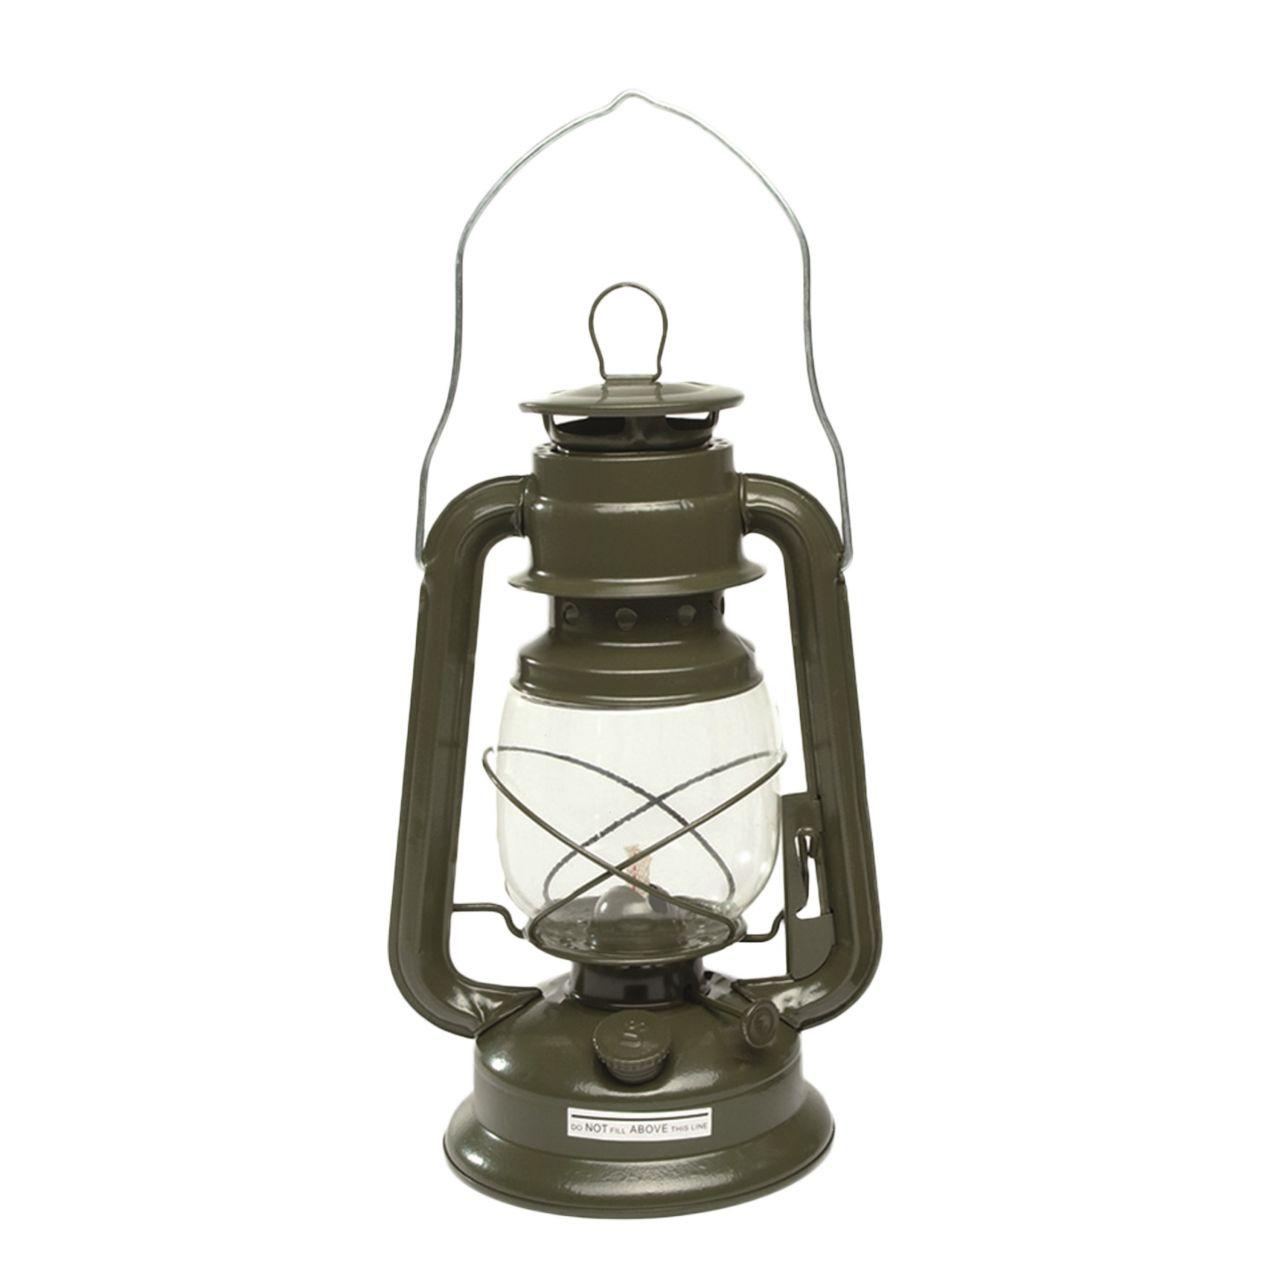 Lampe-temp/ête kaki 28 cm